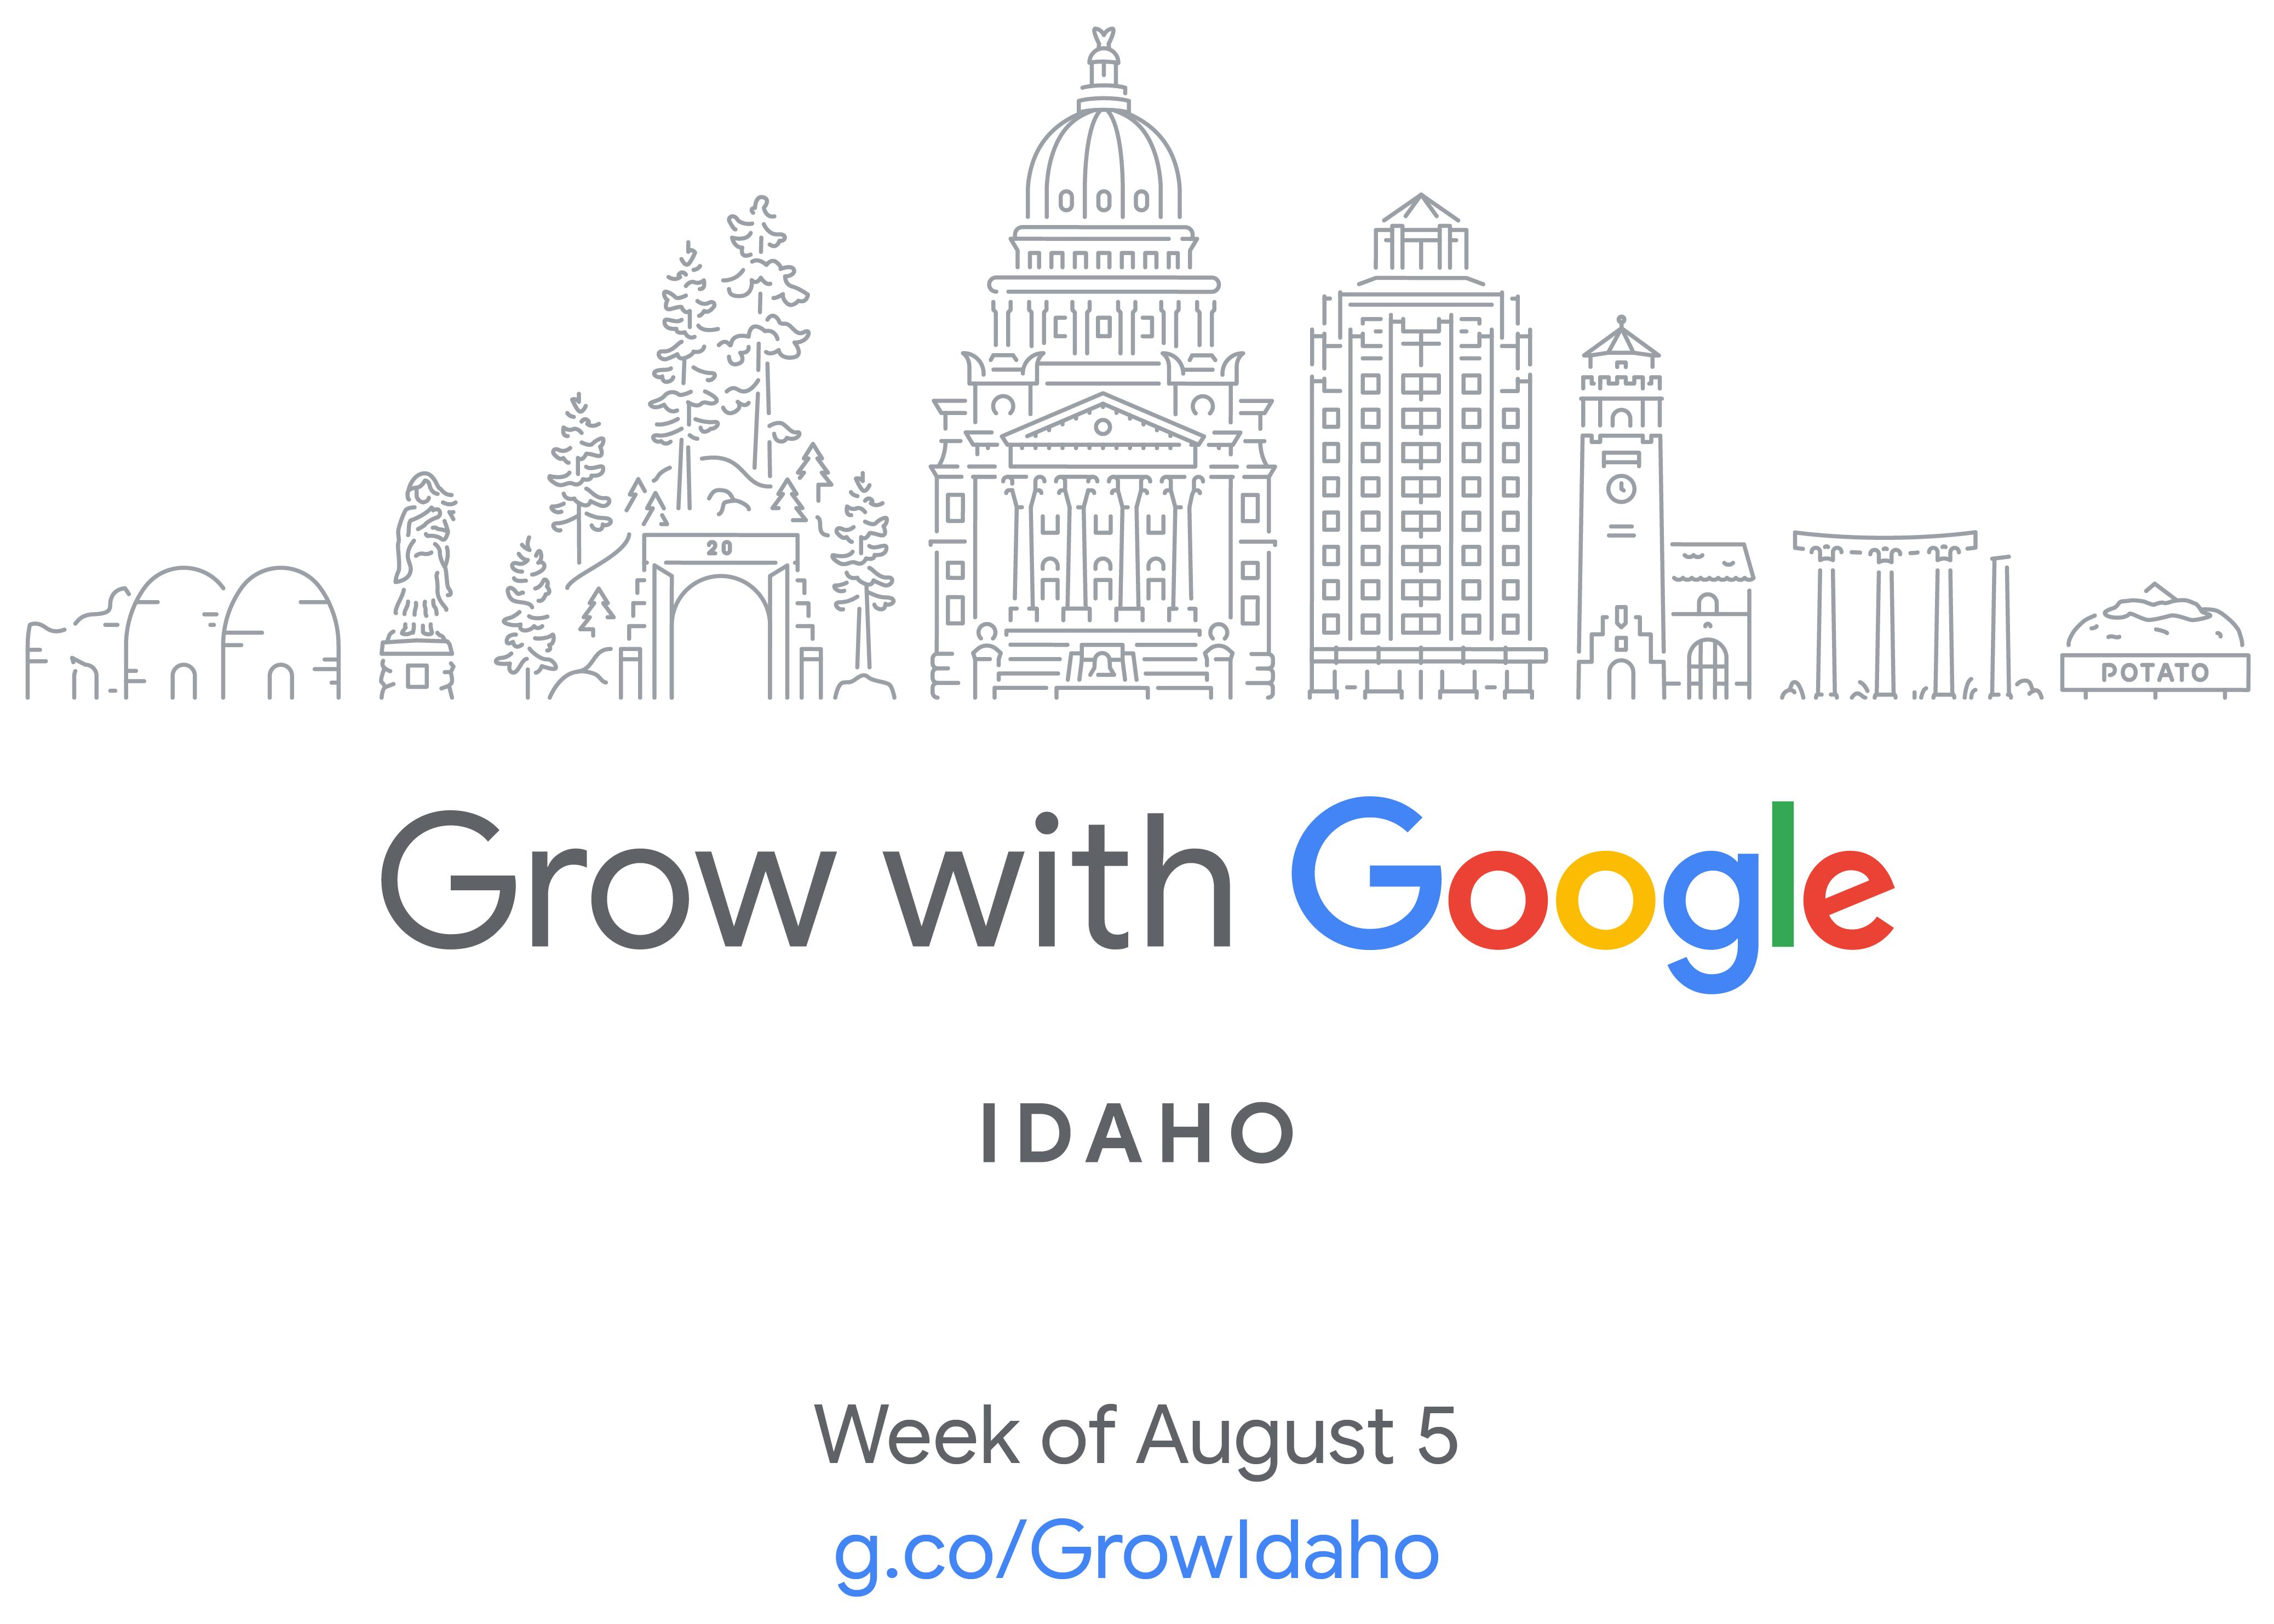 Grow with Google Idaho